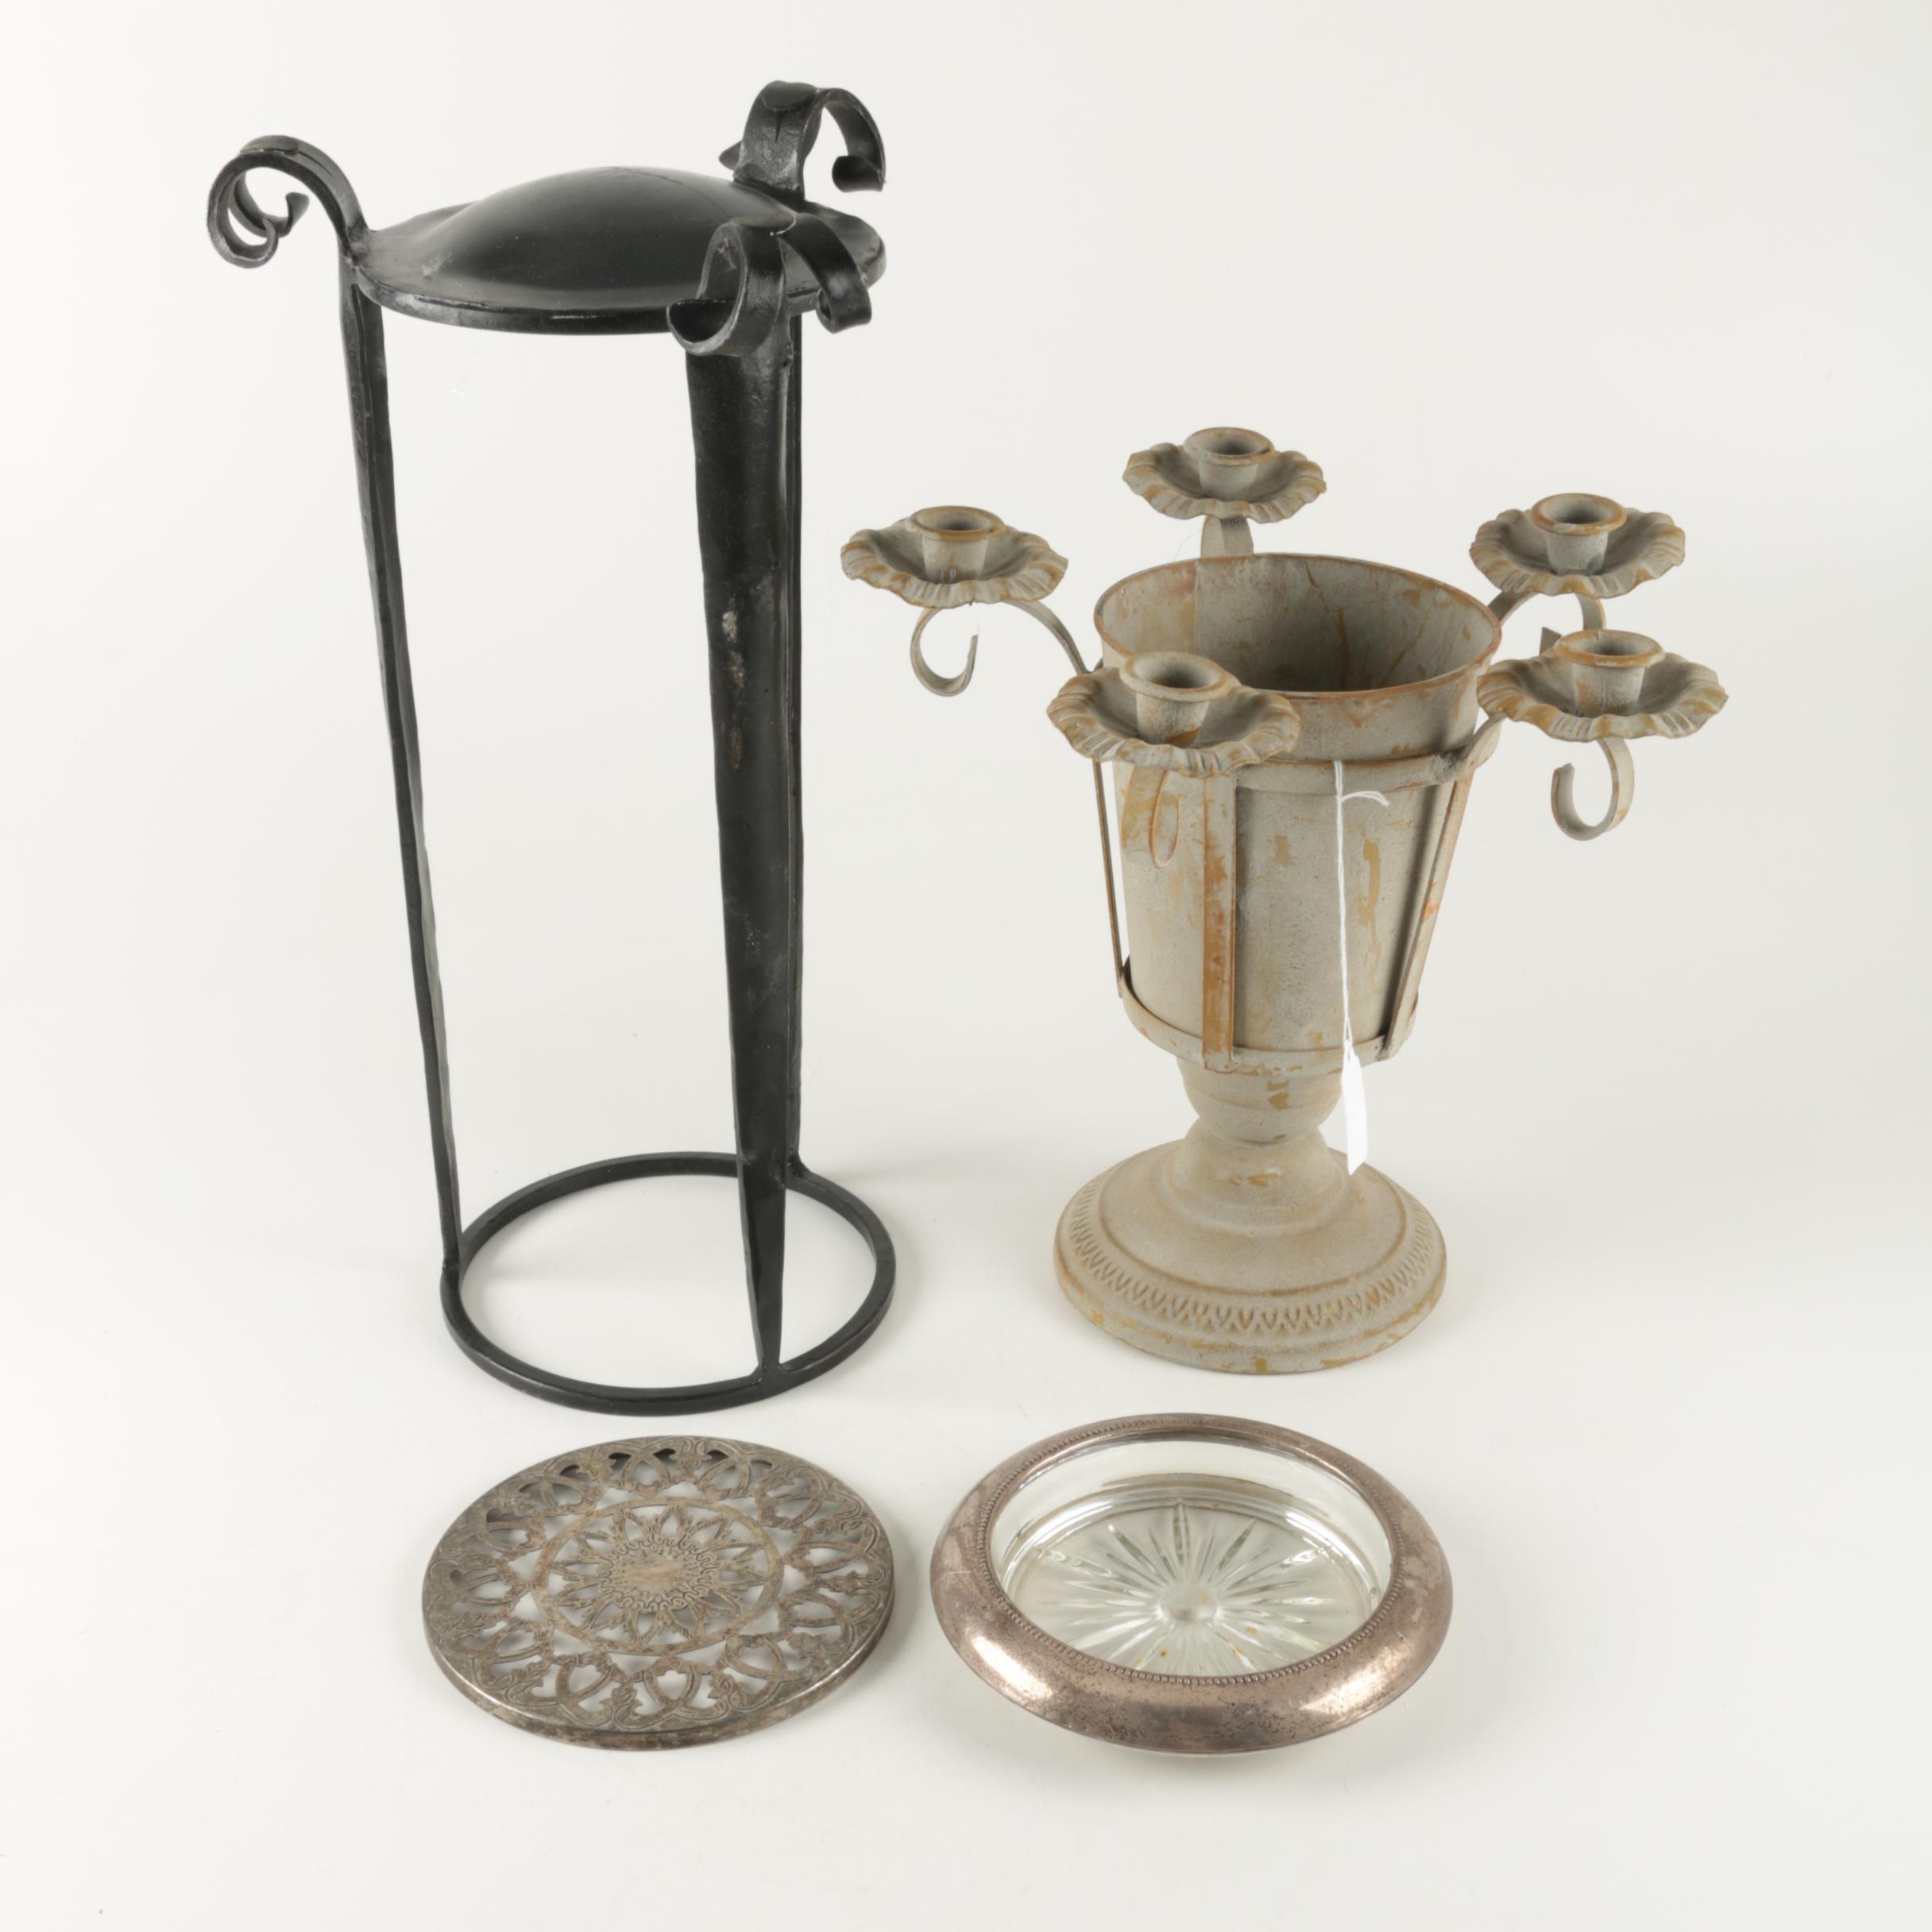 Assortment of Table Décor